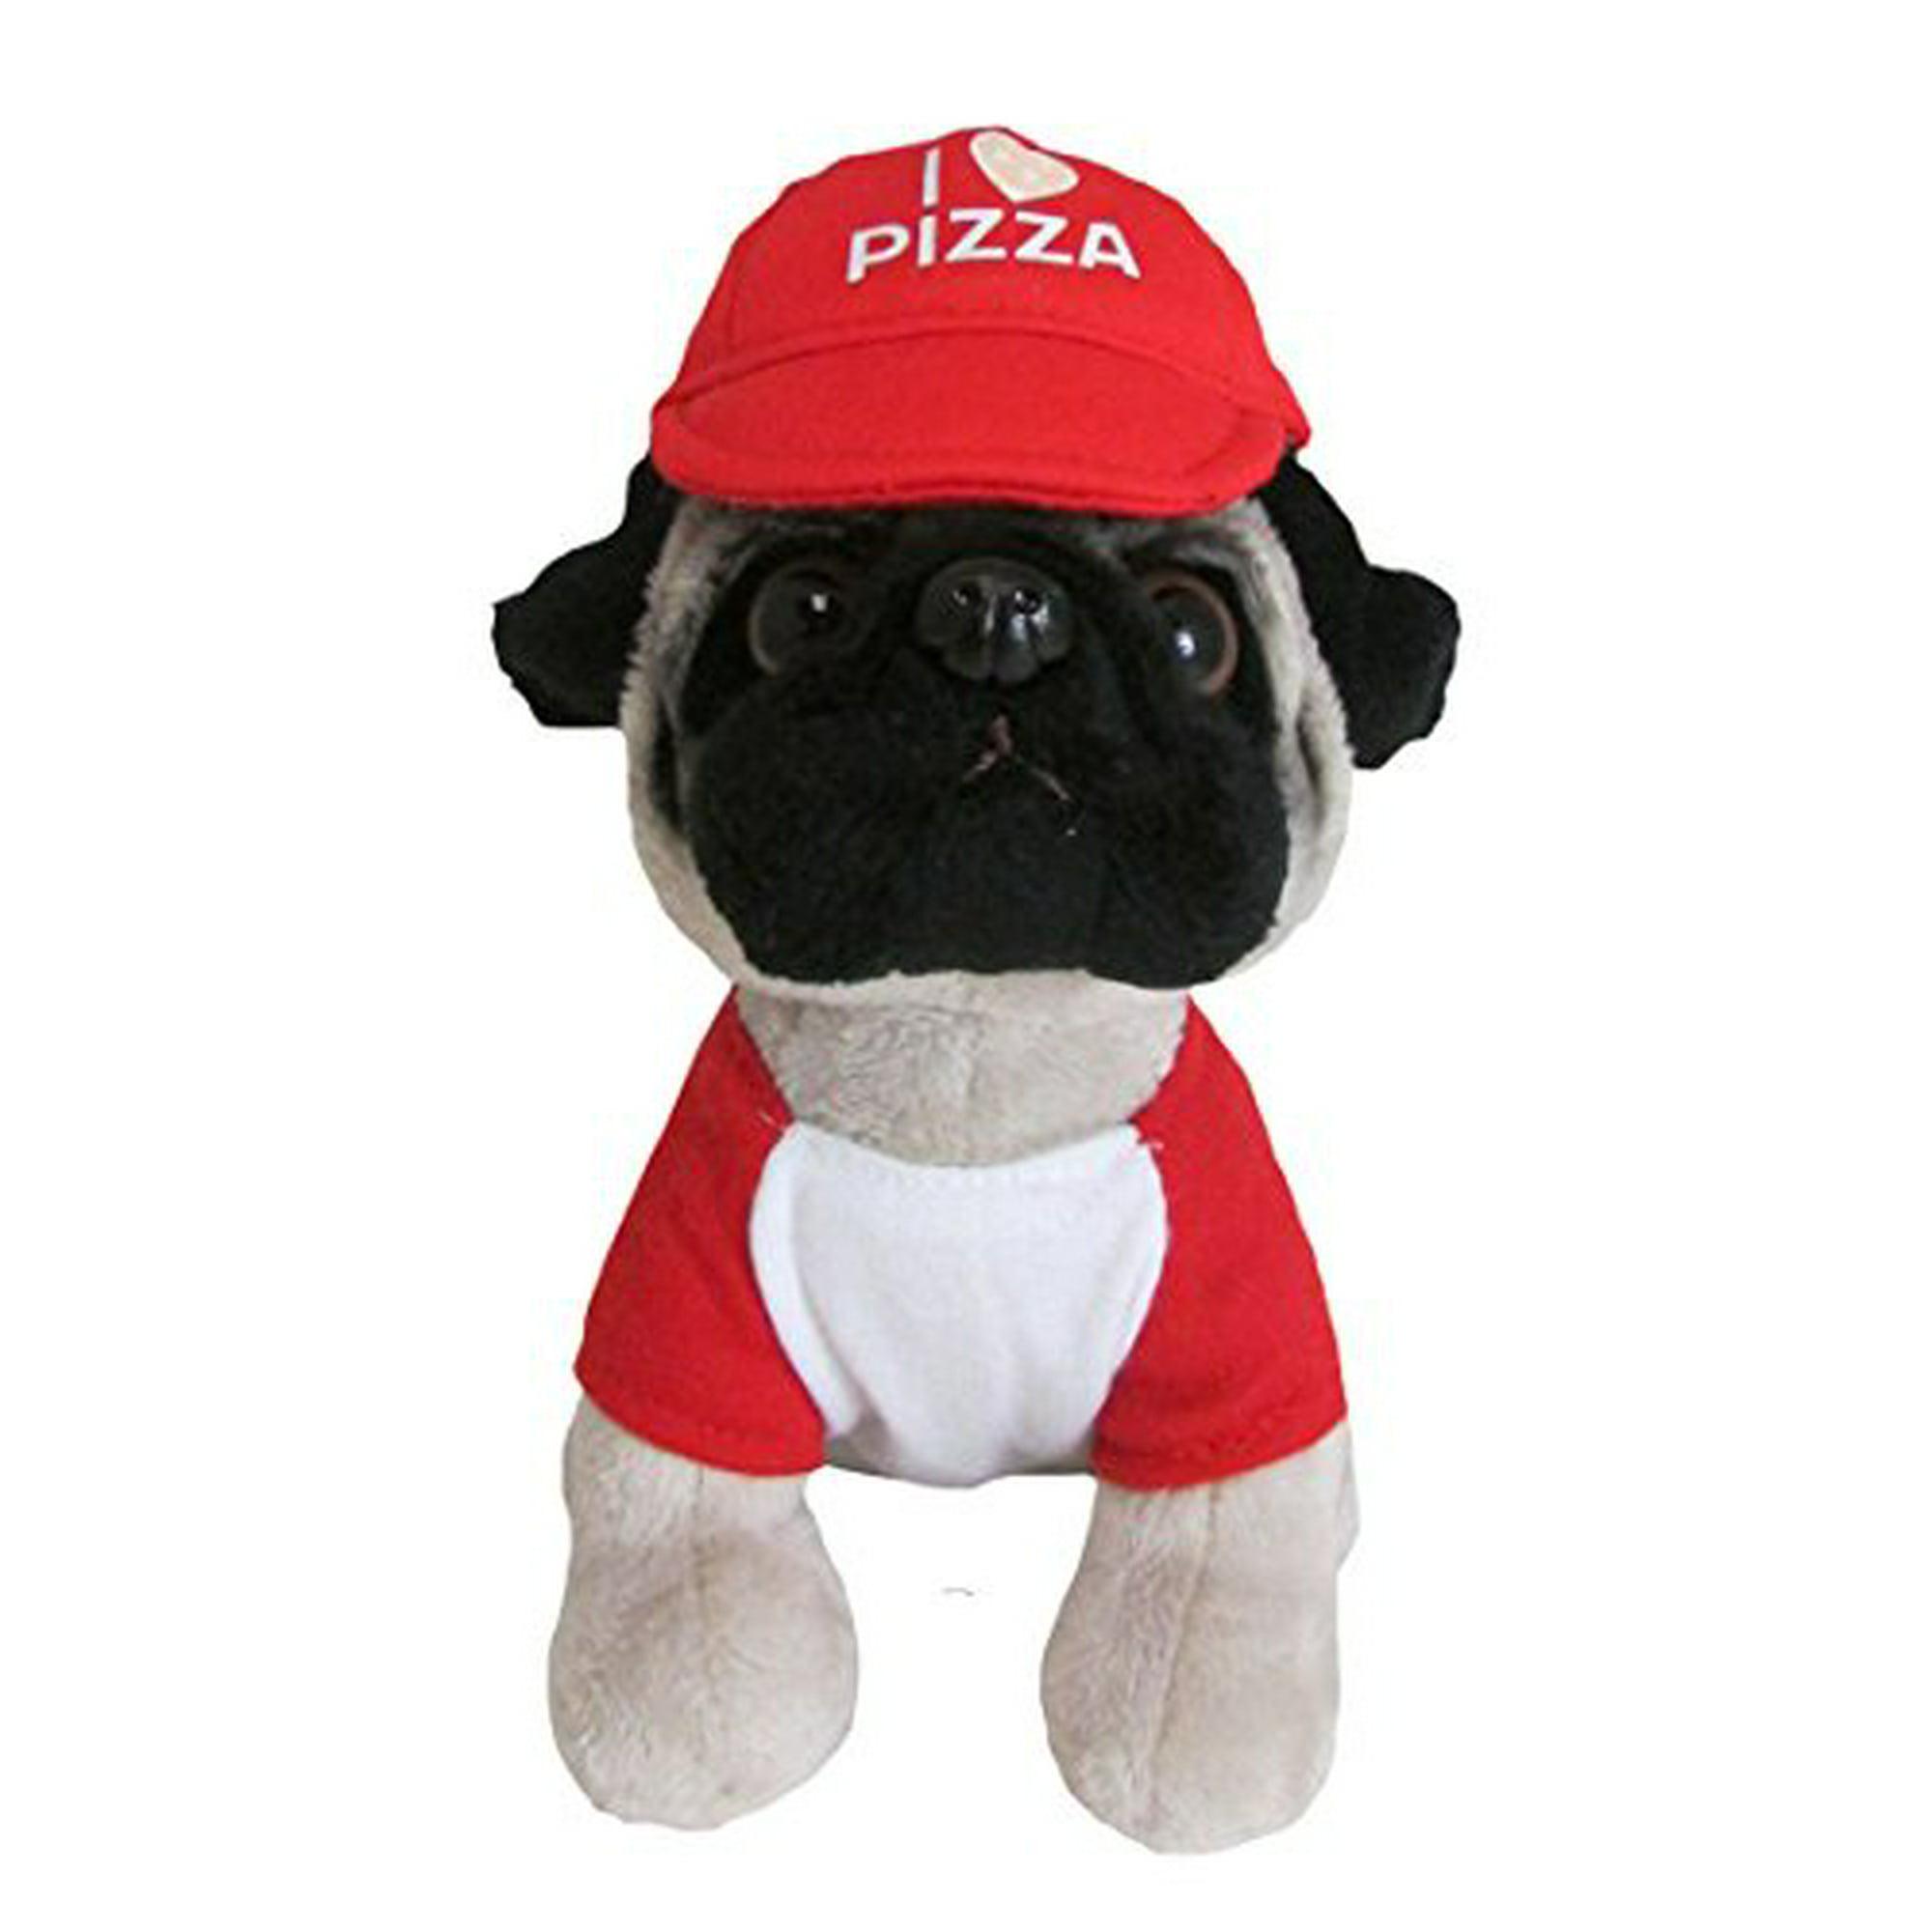 Realistic Pug Stuffed Animal, Doug The Pug Pizza Pug Plush Walmart Canada